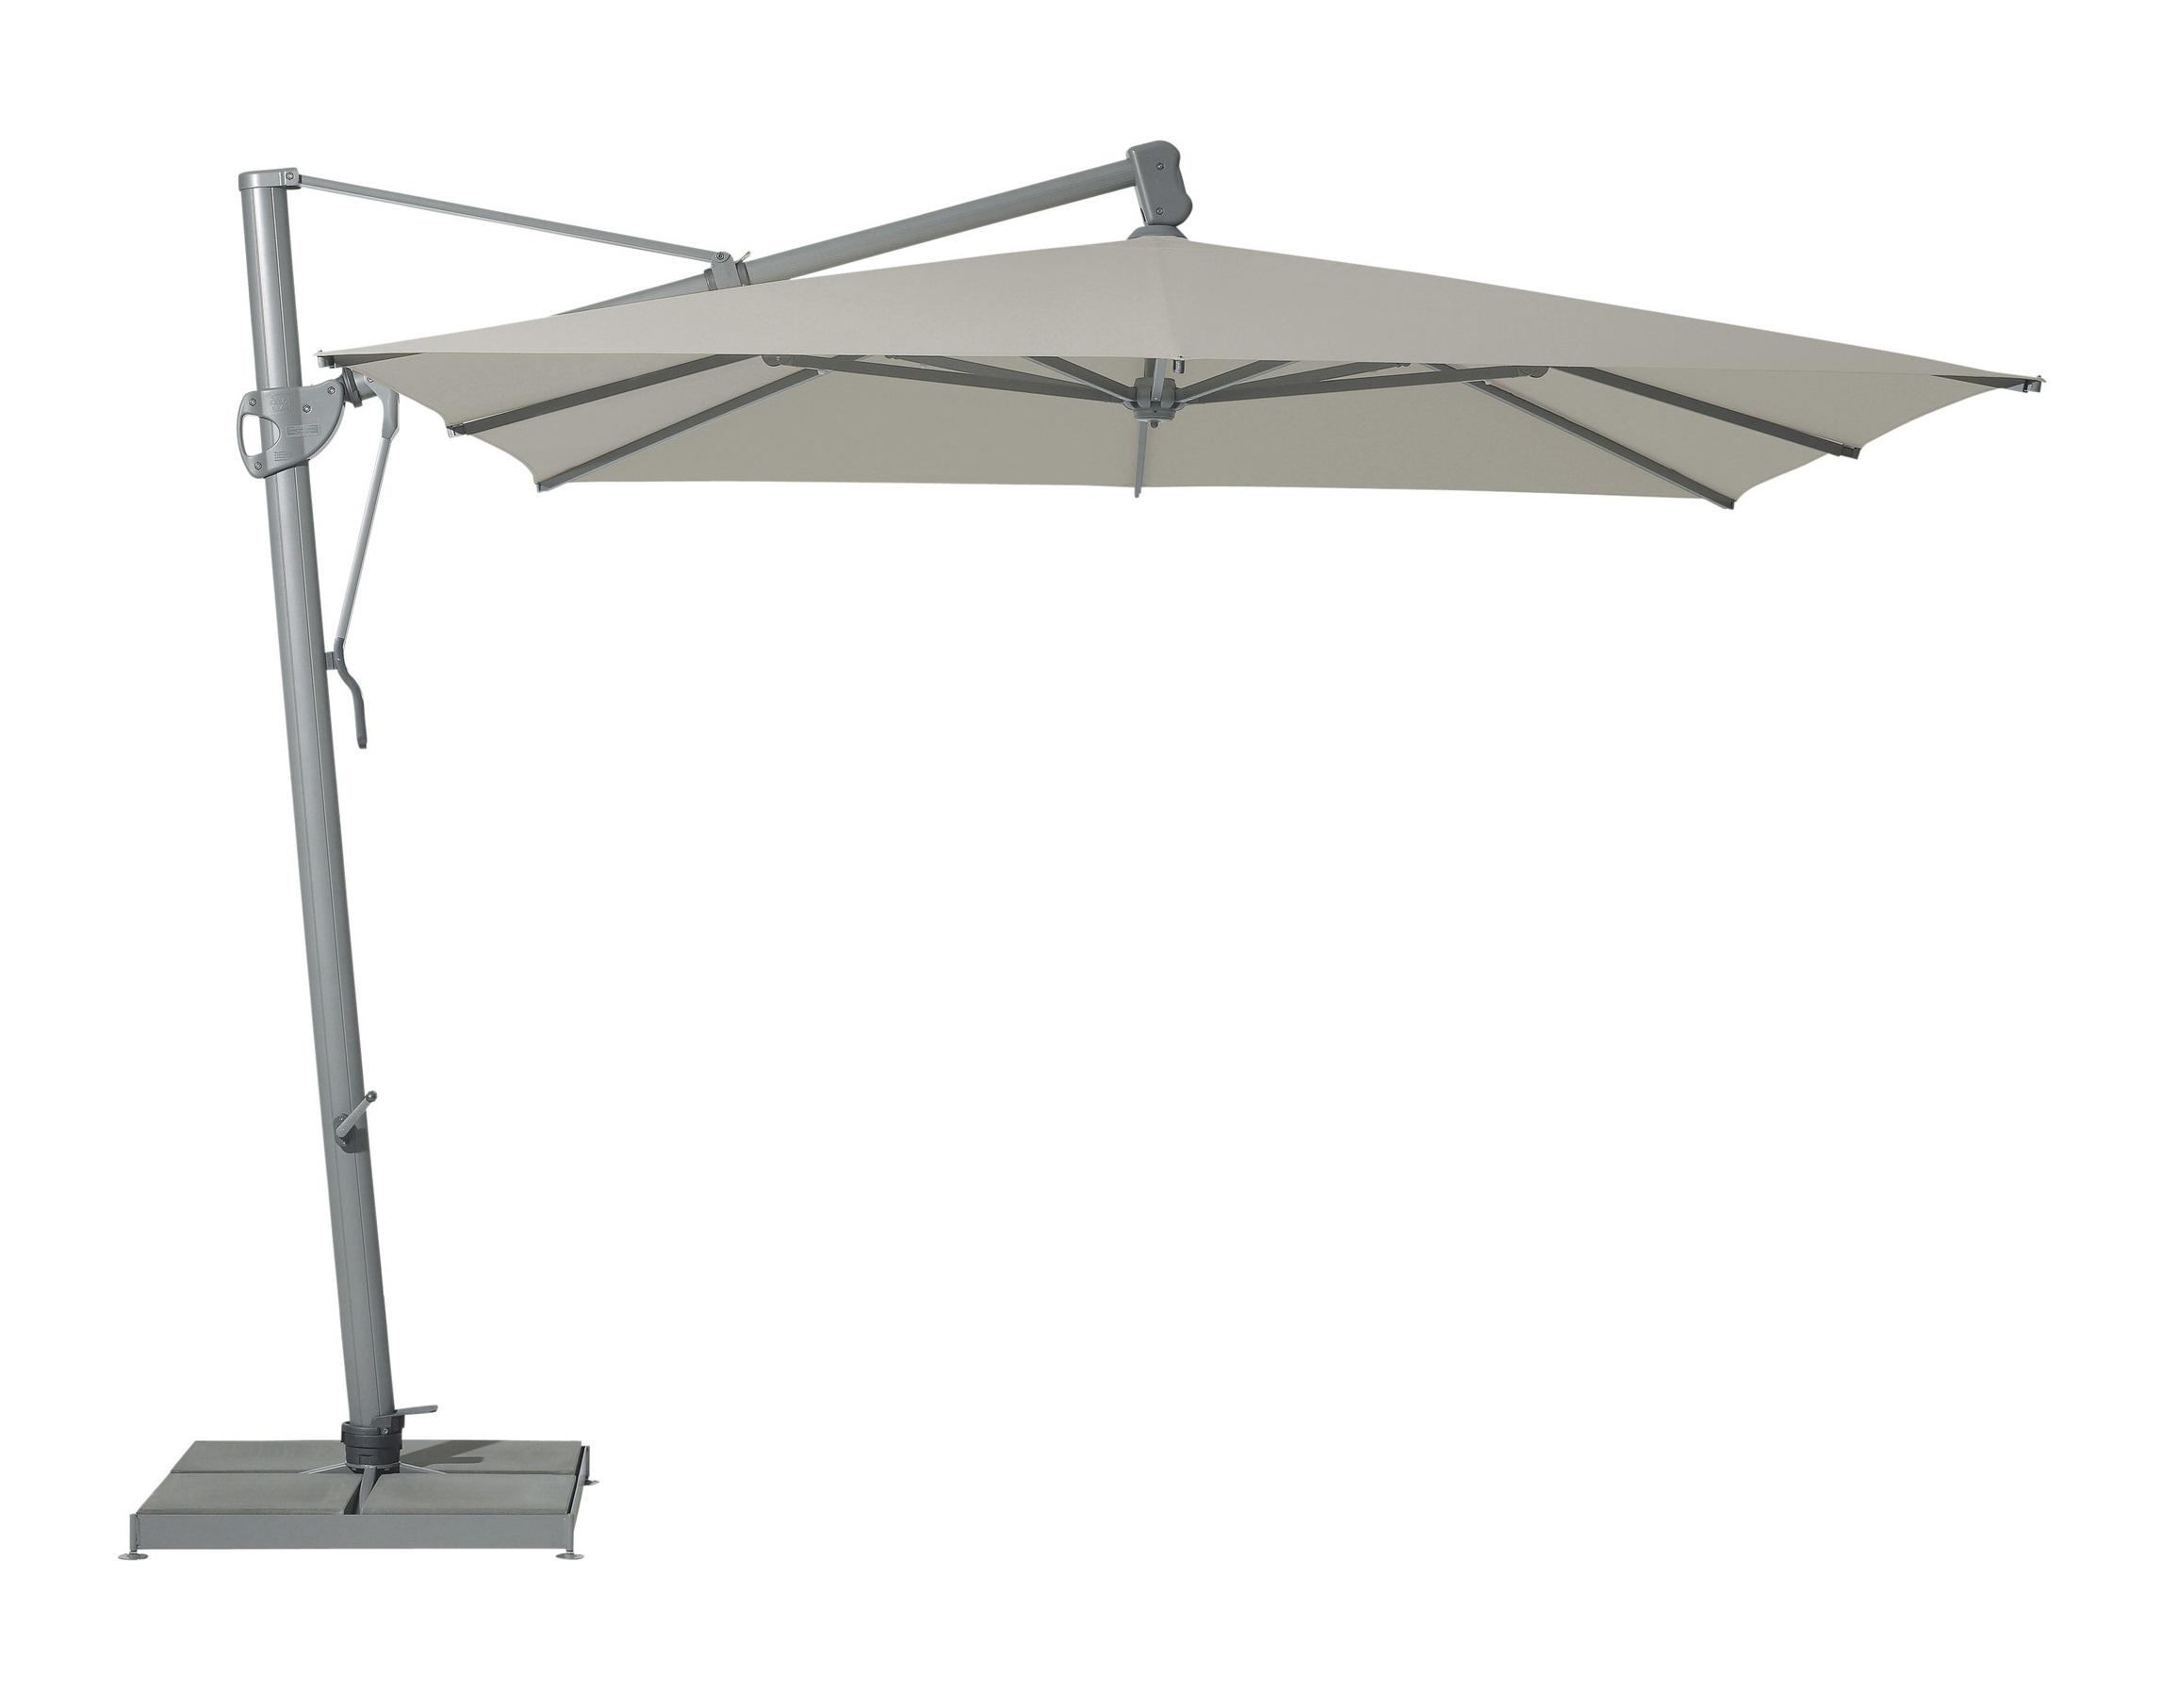 Уличный зонт sombrano easy (glatz) серый 300x300x300 см.